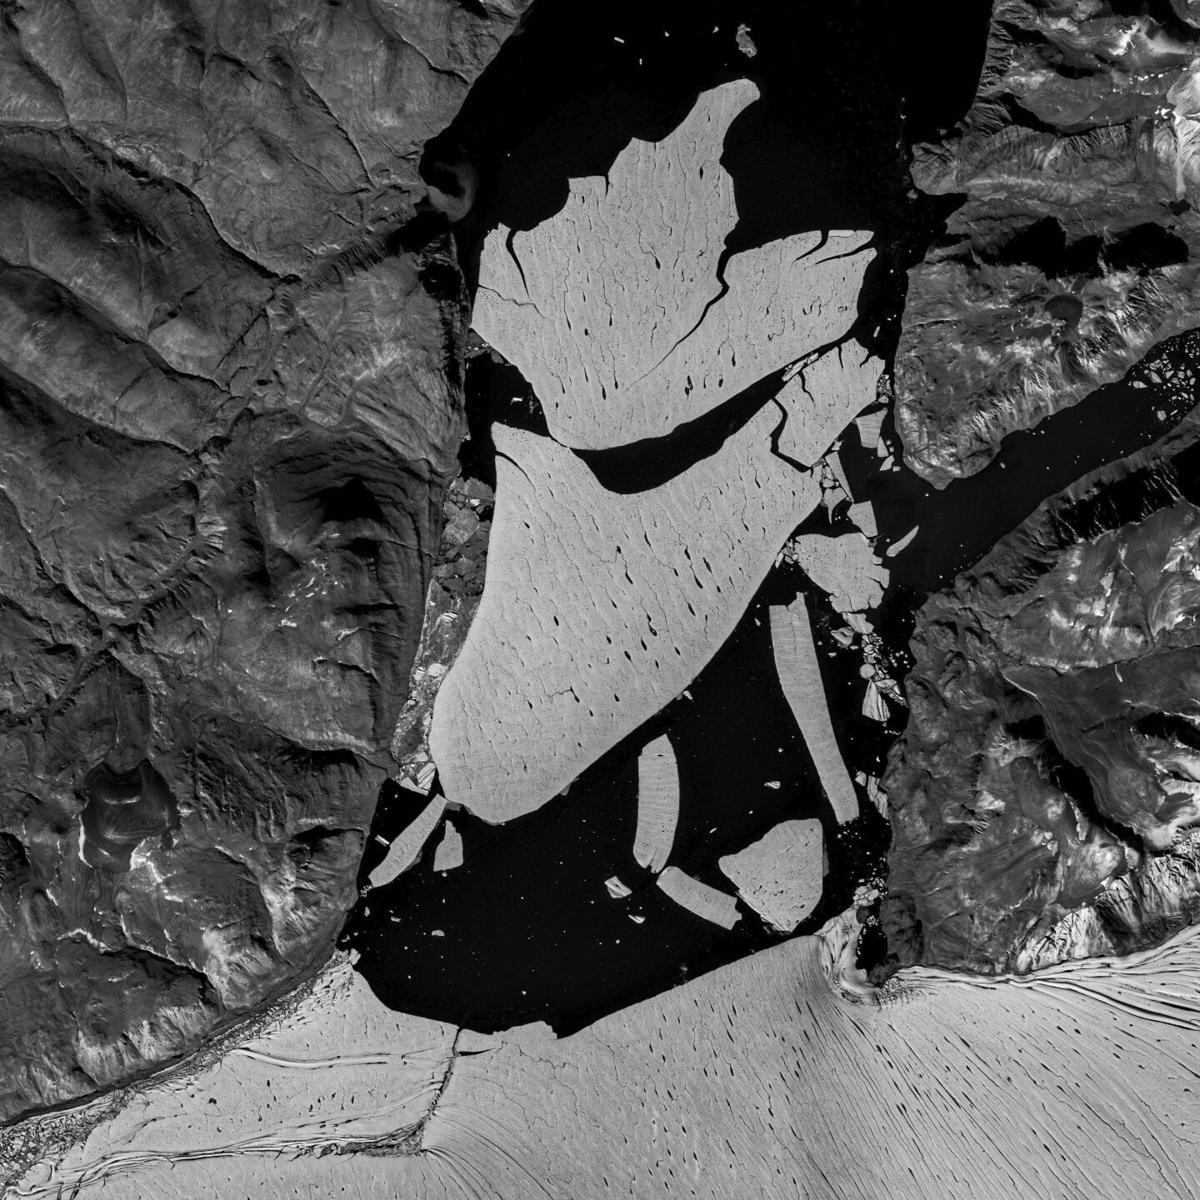 Greenland Ice Sheet